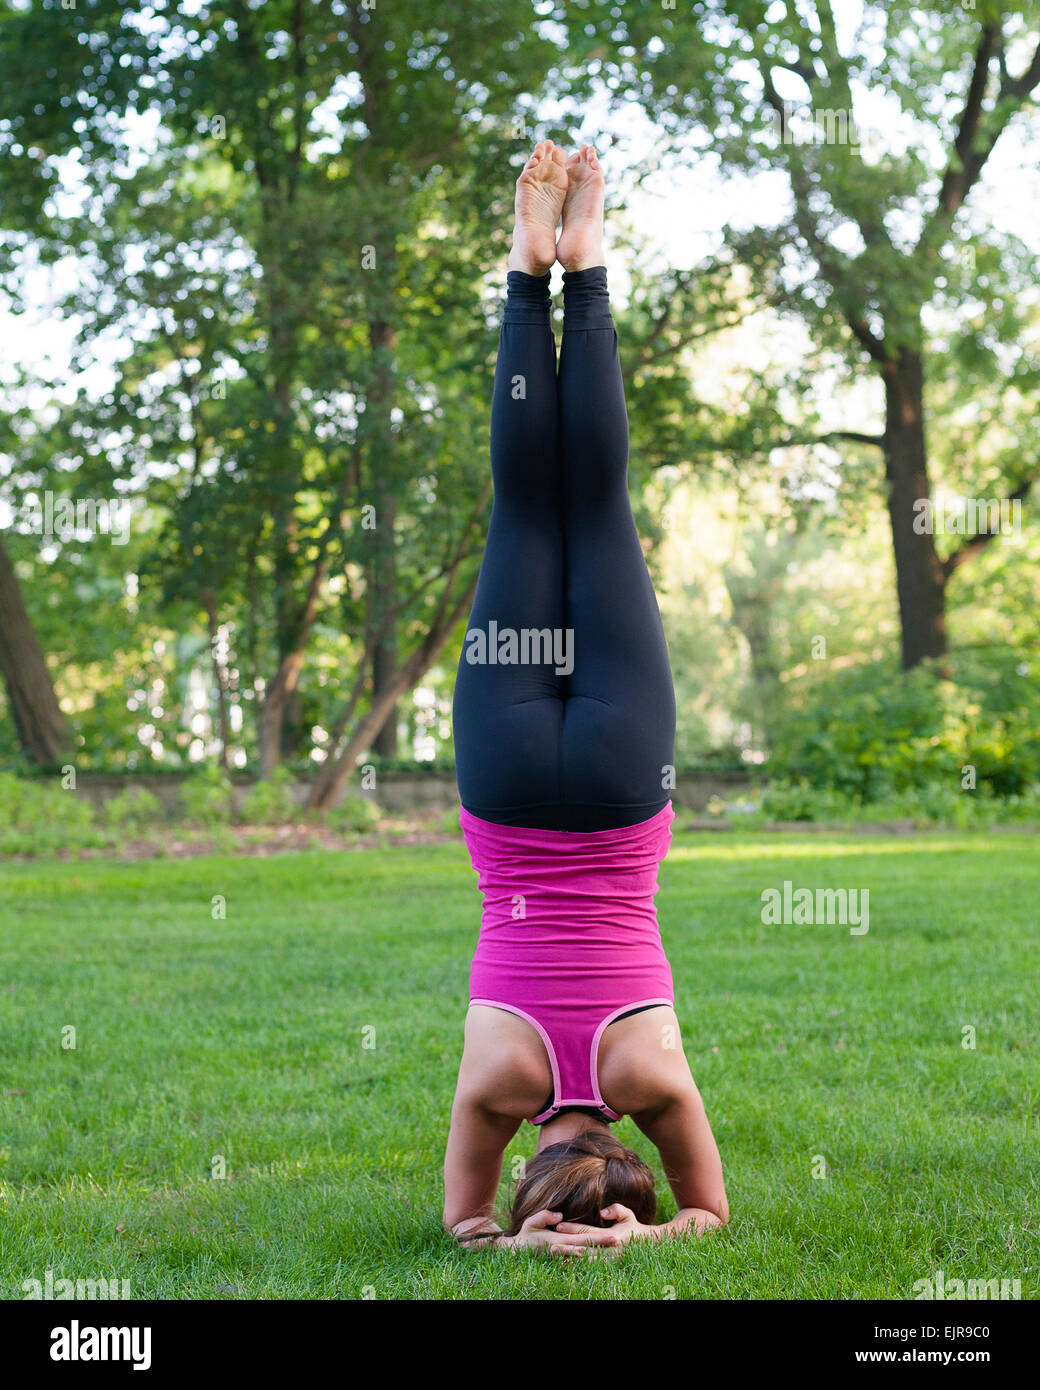 Caucasian woman practicing yoga in park - Stock Image